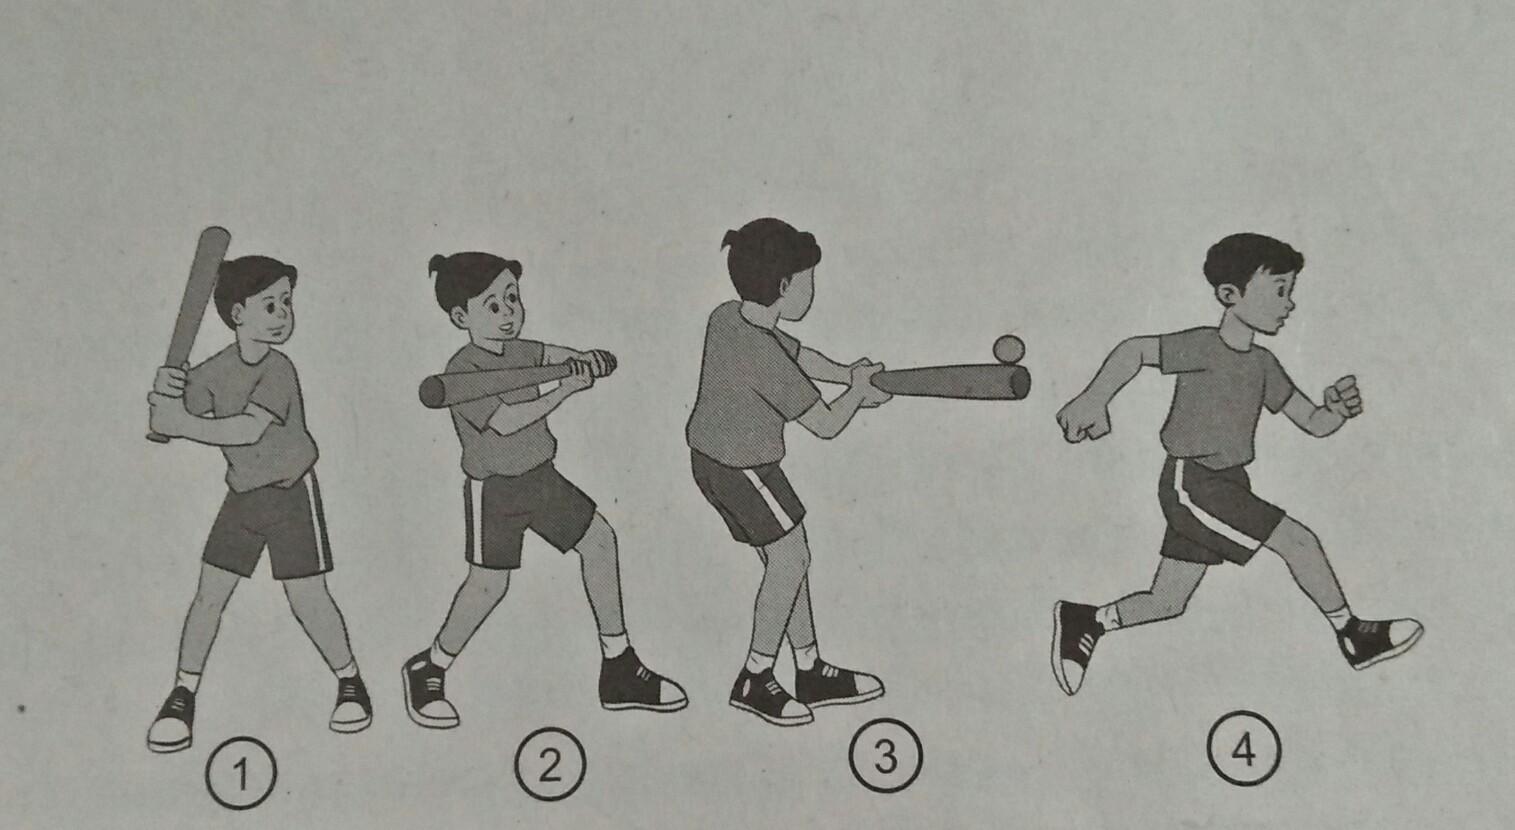 Kombinasi Gerak Dasar Lokomotor Nonlokomotor Dan Manipulatif Dalam Permainan Bola Kecil Penjaskes